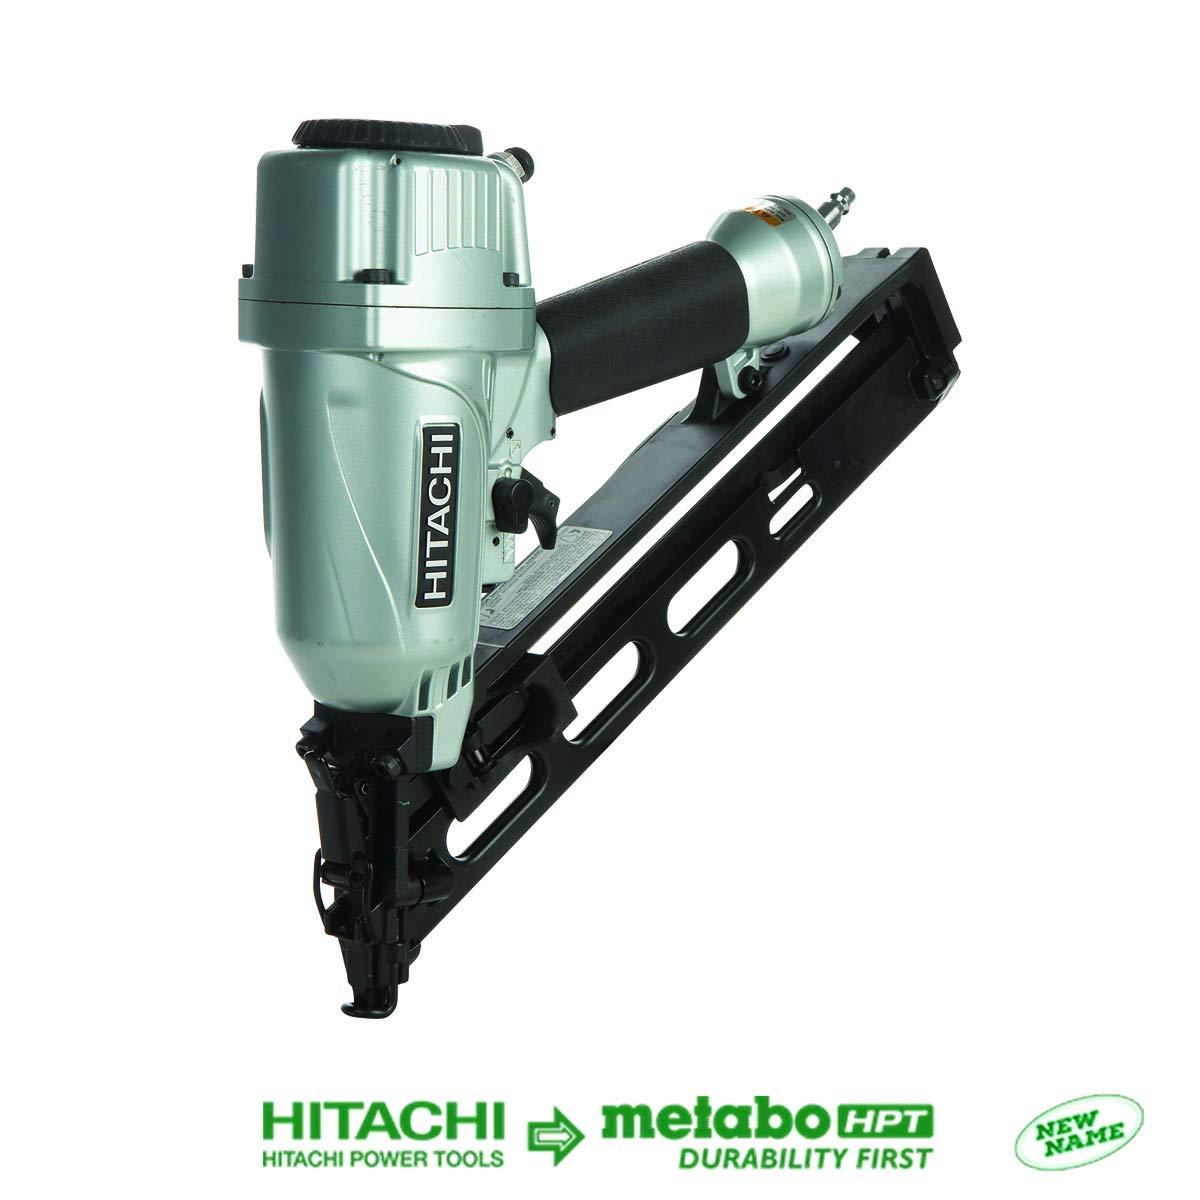 Hitachi NT65MA4 15-Gauge Angled Finish Nailer